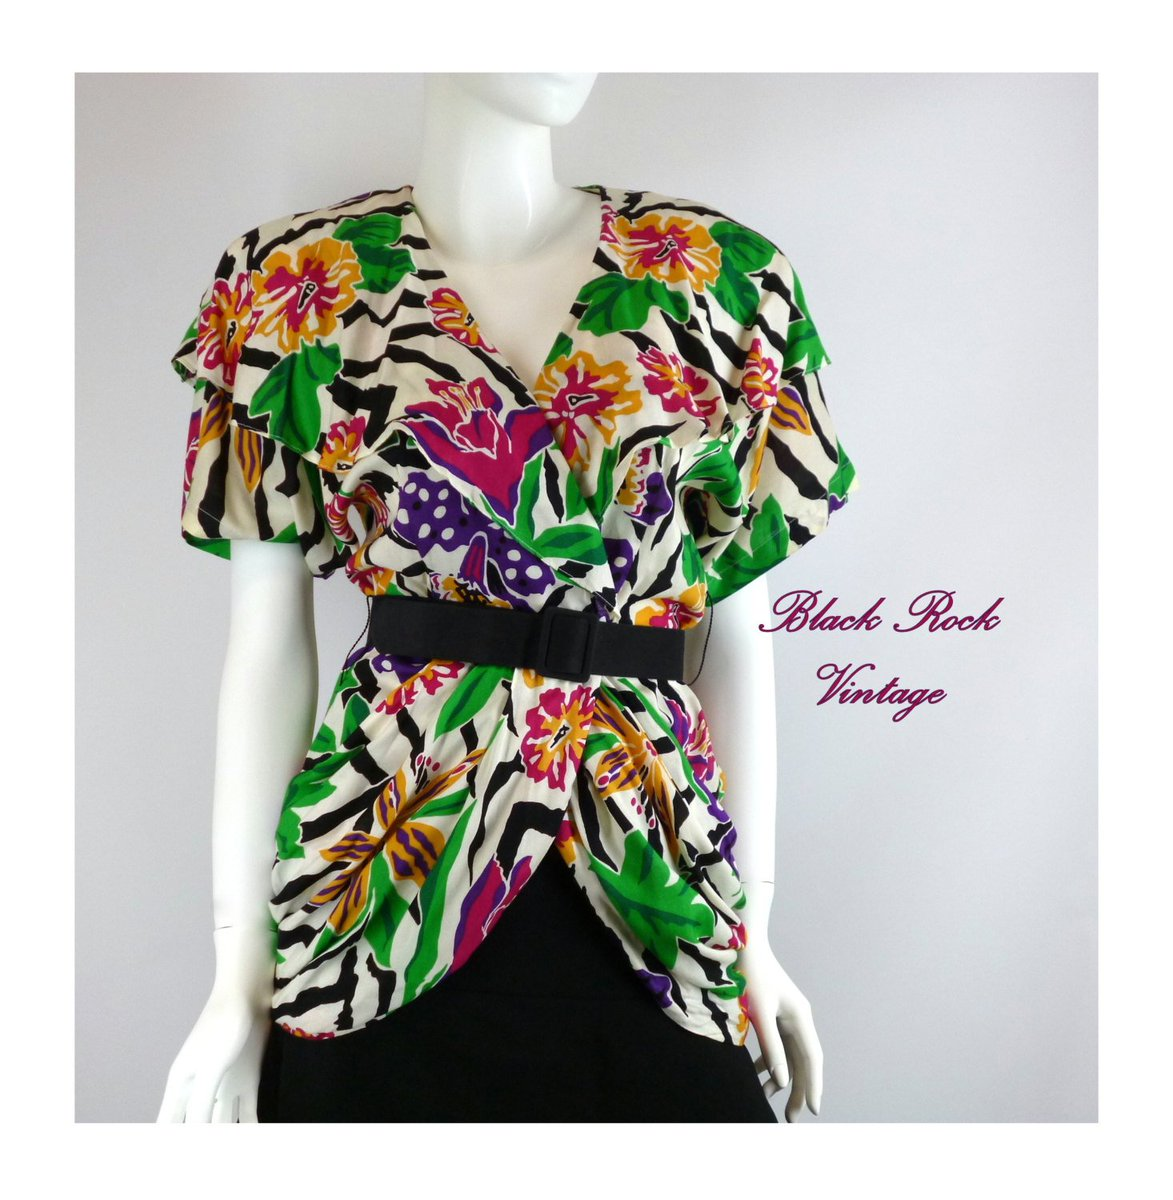 Floral Jacket Tropical Print, Jewel Tones Shawl Collar, Vin… http://etsy.me/2rvVE76 #BlackRockVintage #DrapedBlouse pic.twitter.com/b8W7YVPcqf